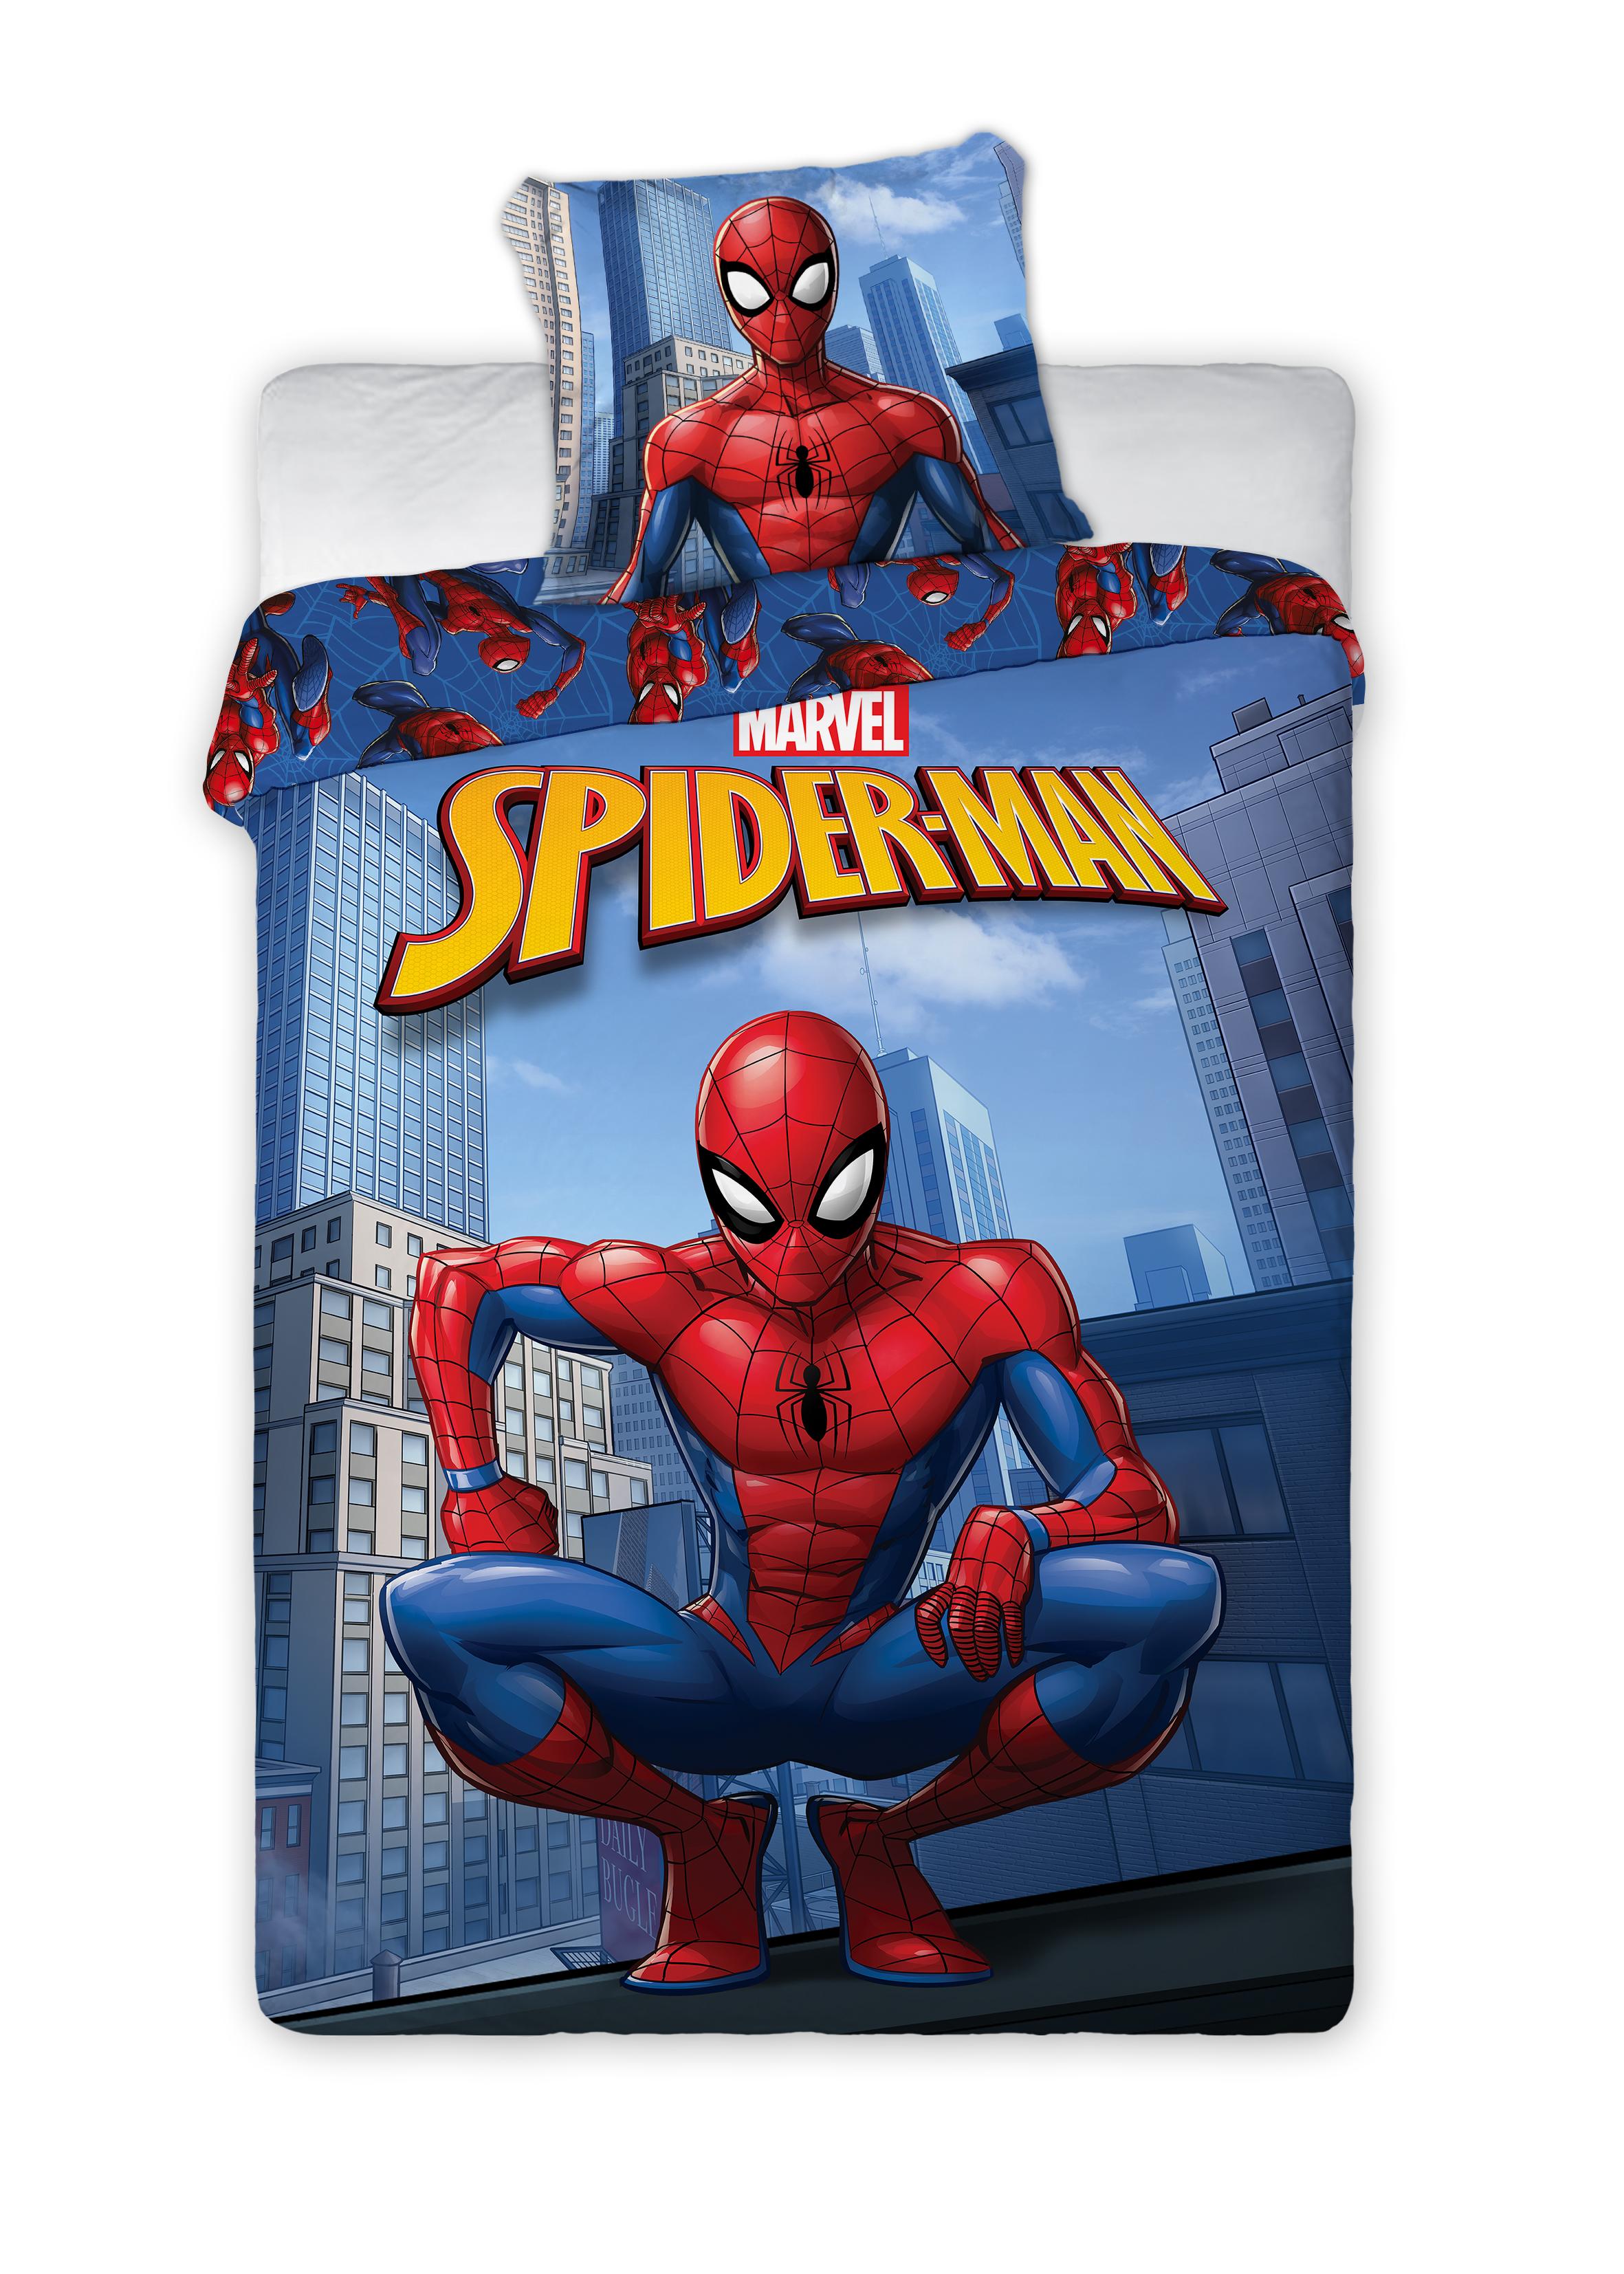 Bed Linen - Adult Size 140 x 200 cm - Spiderman (SM074-CS)